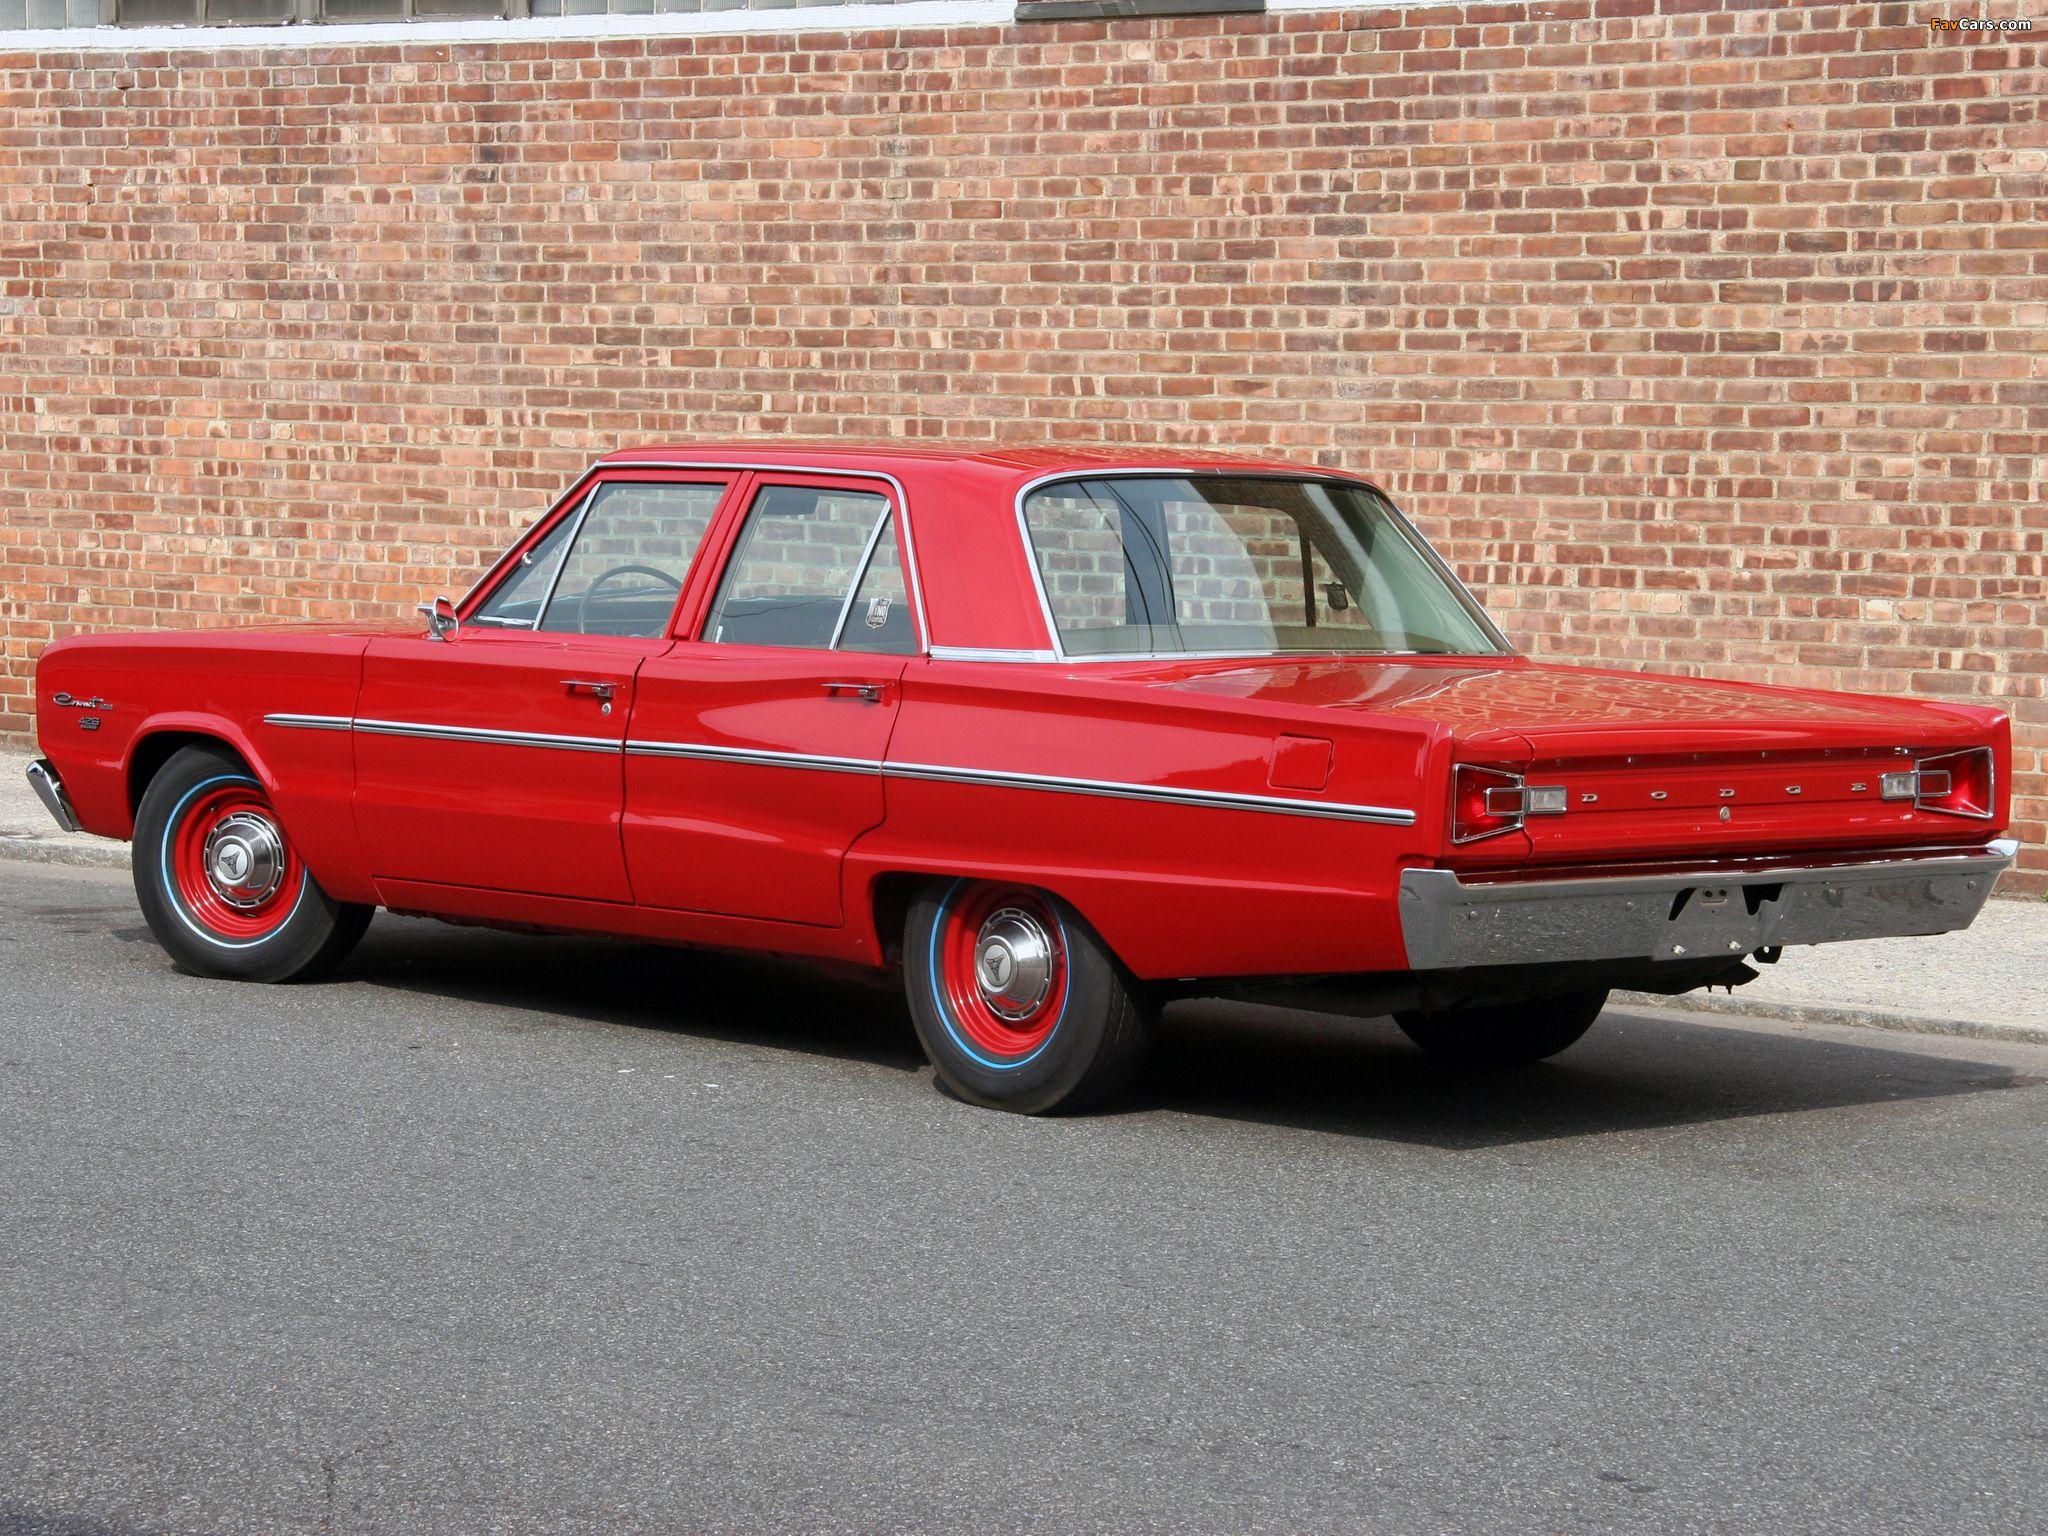 1966 Dodge Coronet Information And Photos Momentcar Dodge Coronet Dodge Coronet